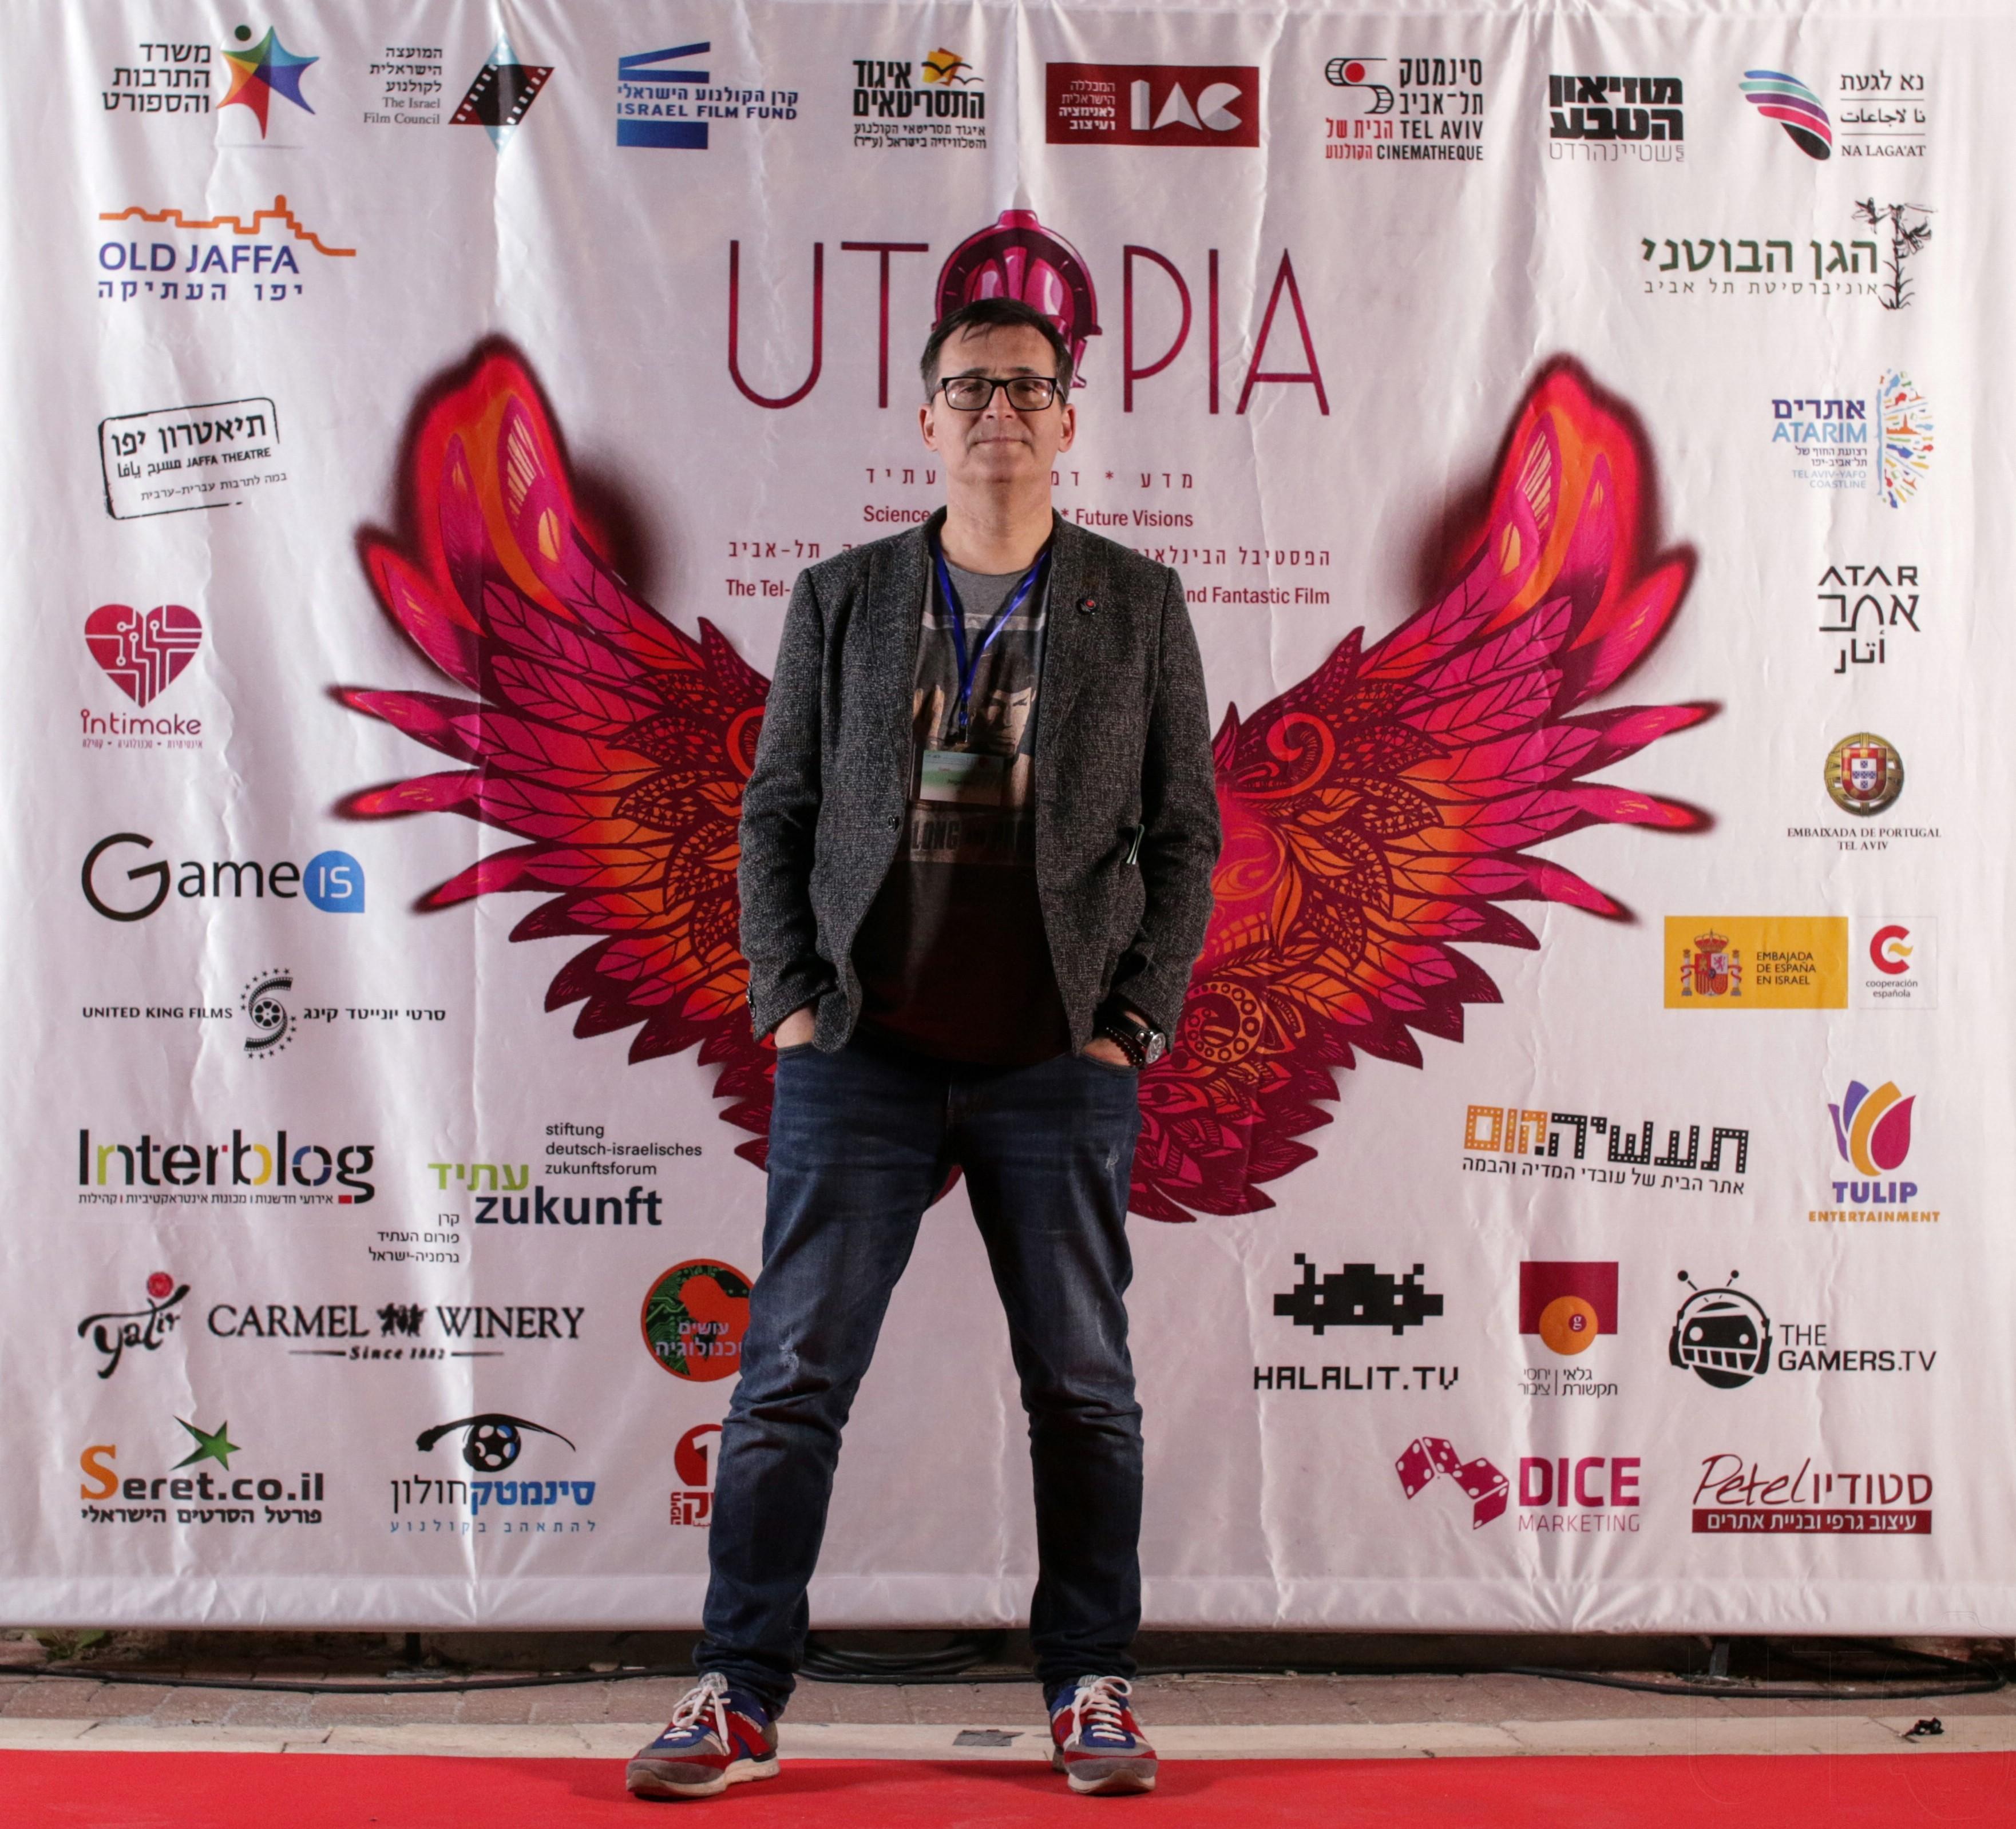 Utopia 2018 Angel Sala Photo Cred Nir Mi